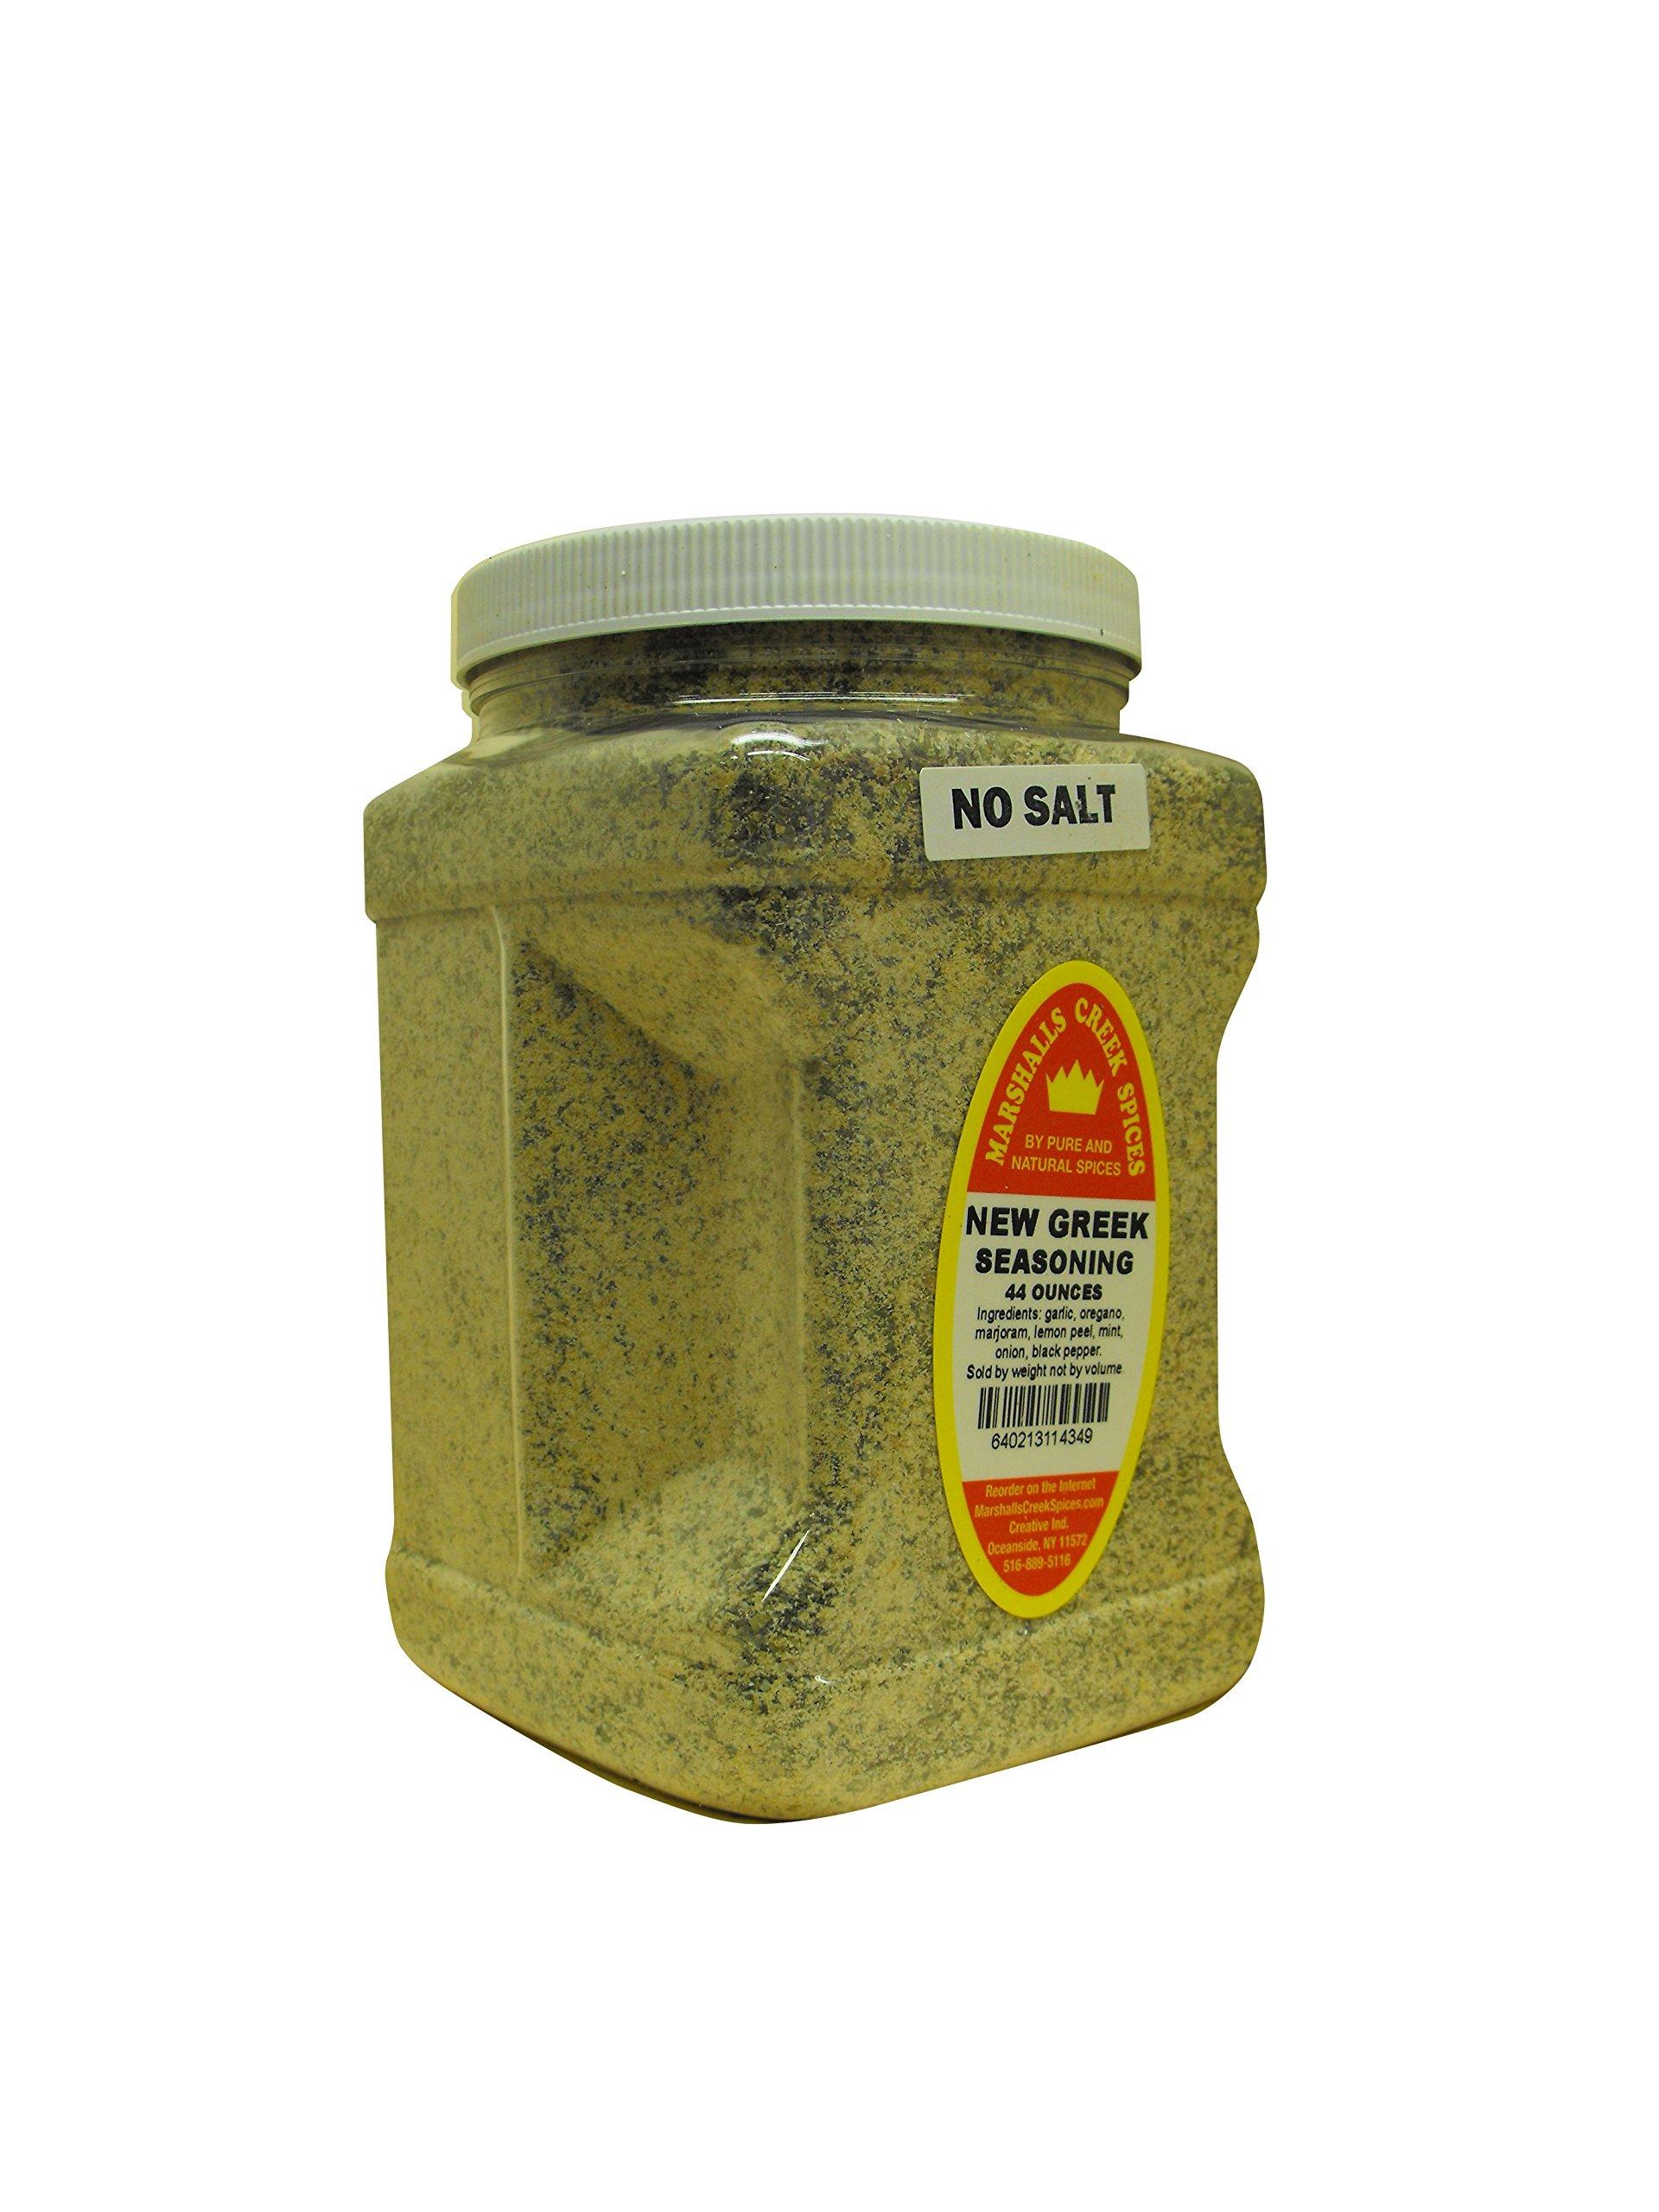 Marshalls Creek Spices Family Size New Greek No Salt Seasoning, 44 Count